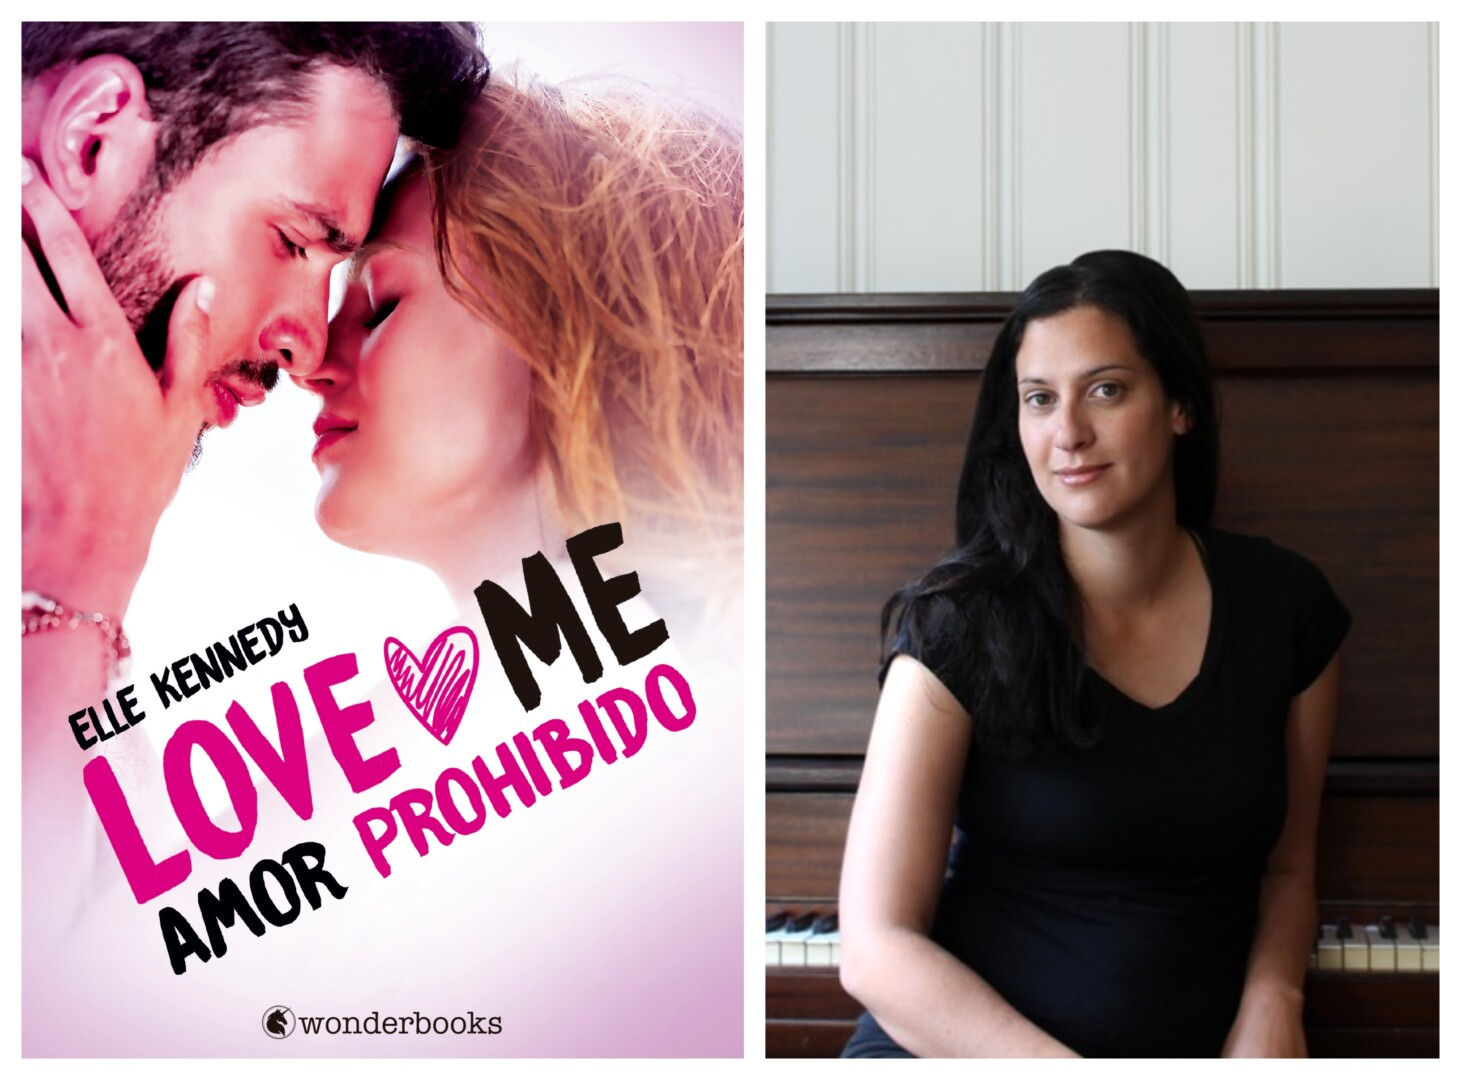 'Love me: amor prohibido' de Elle Kennedy, se publica a